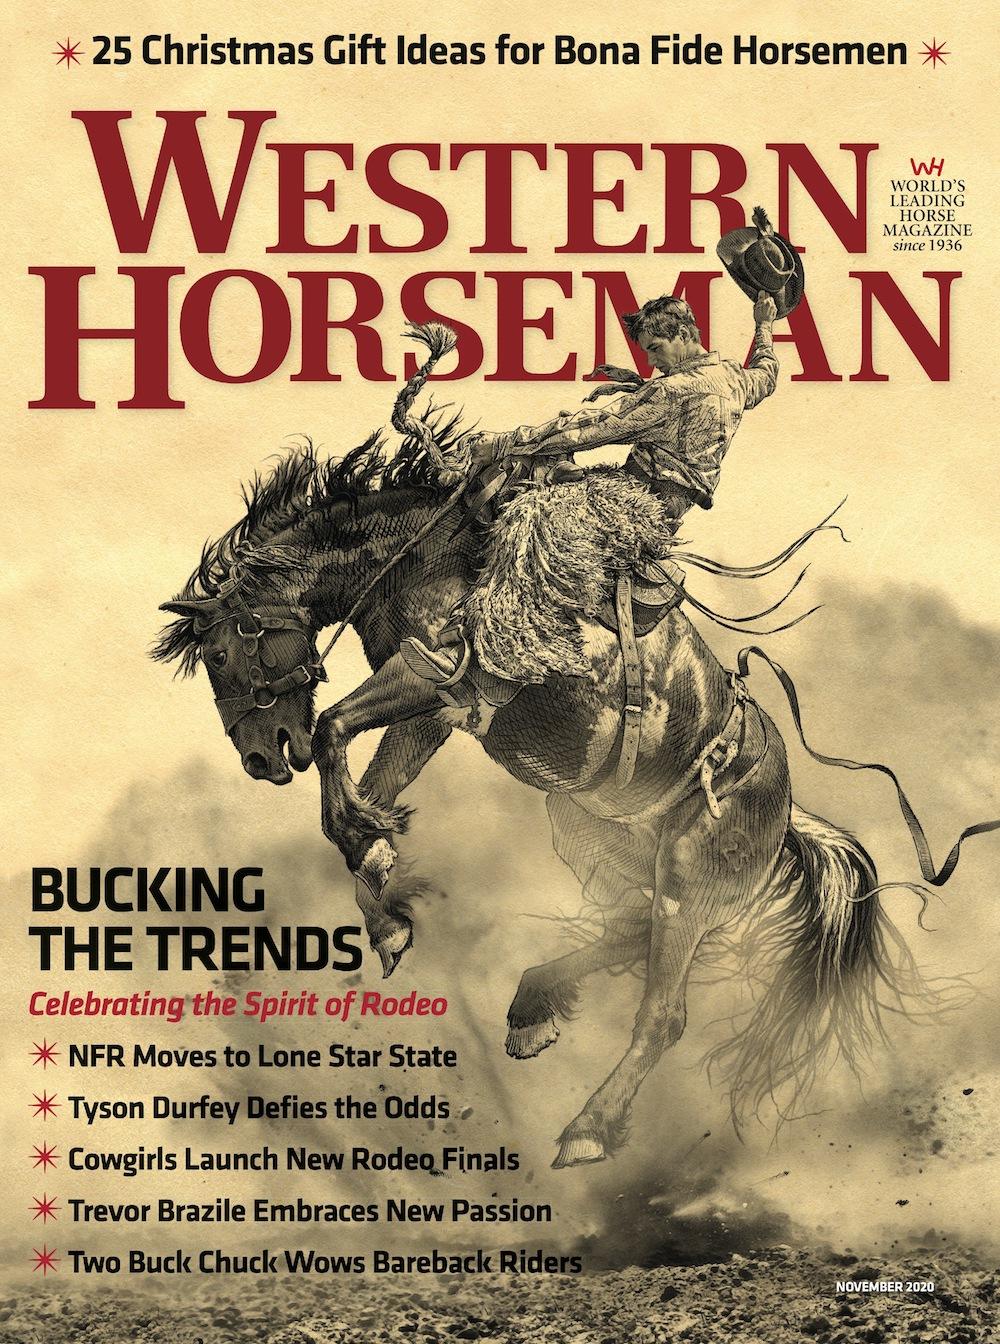 November 2020 Western Horseman cover